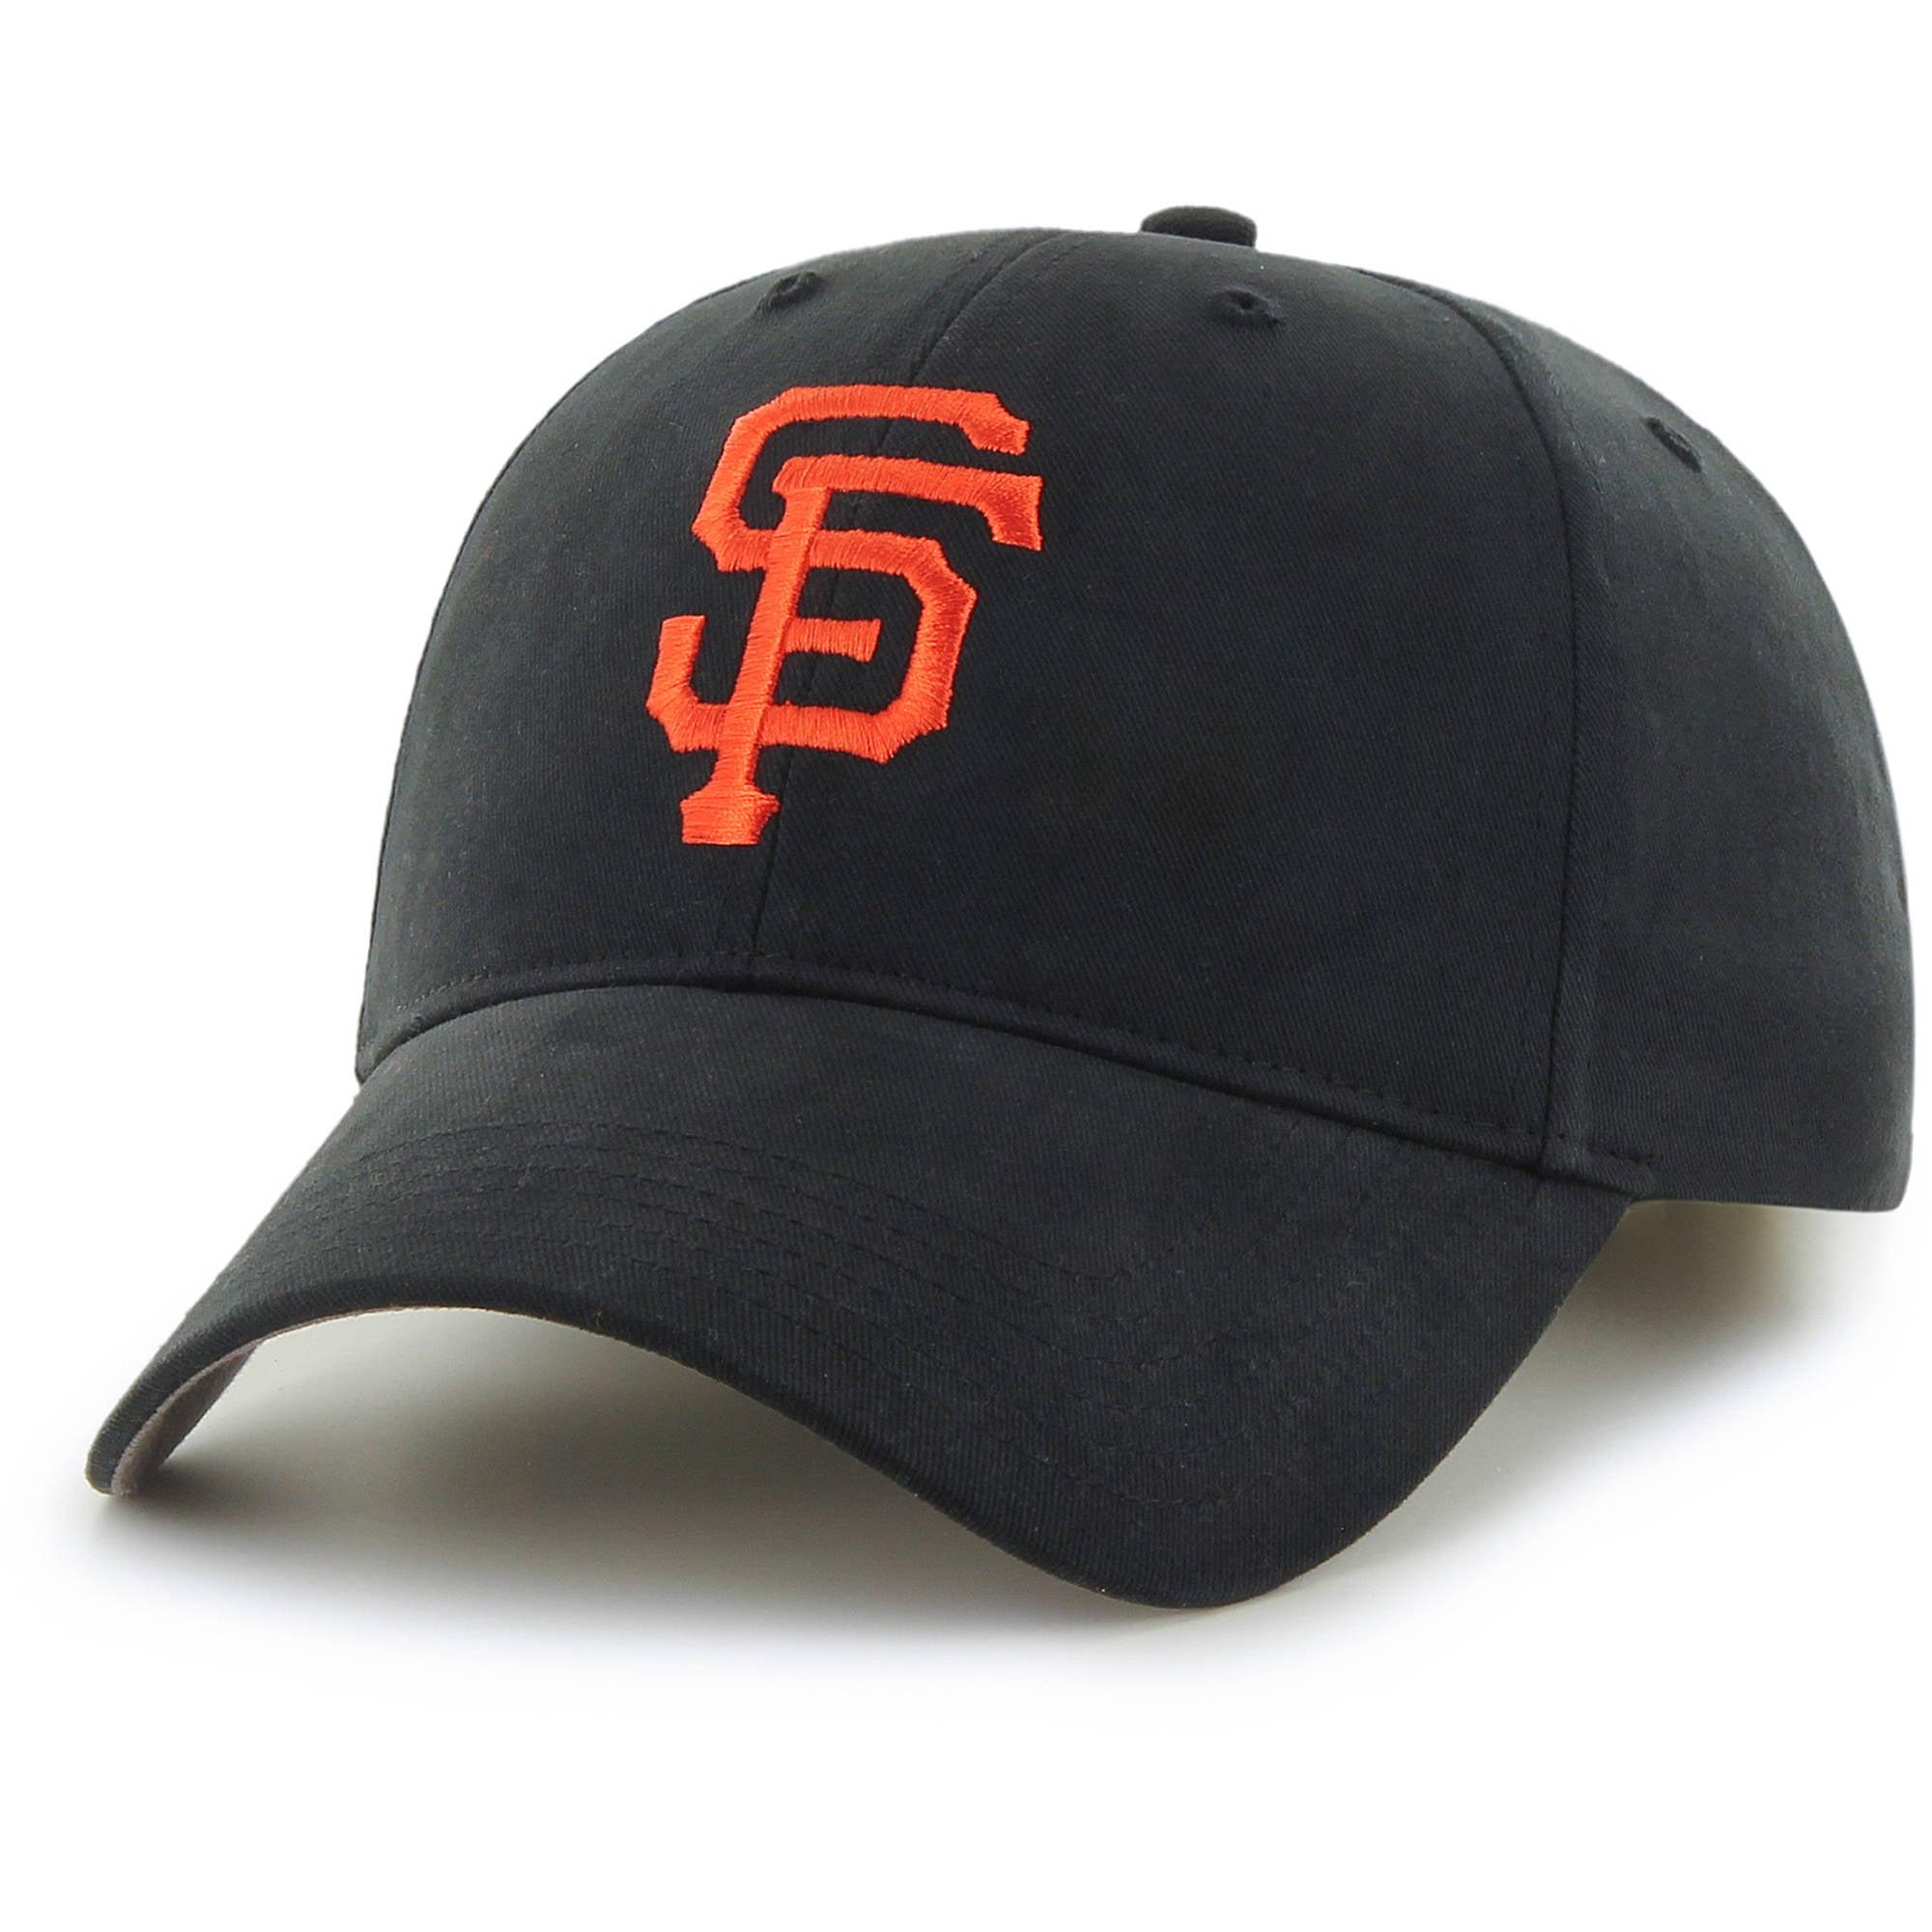 MLB San Francisco Giants Basic Cap / Hat by Fan Favorite